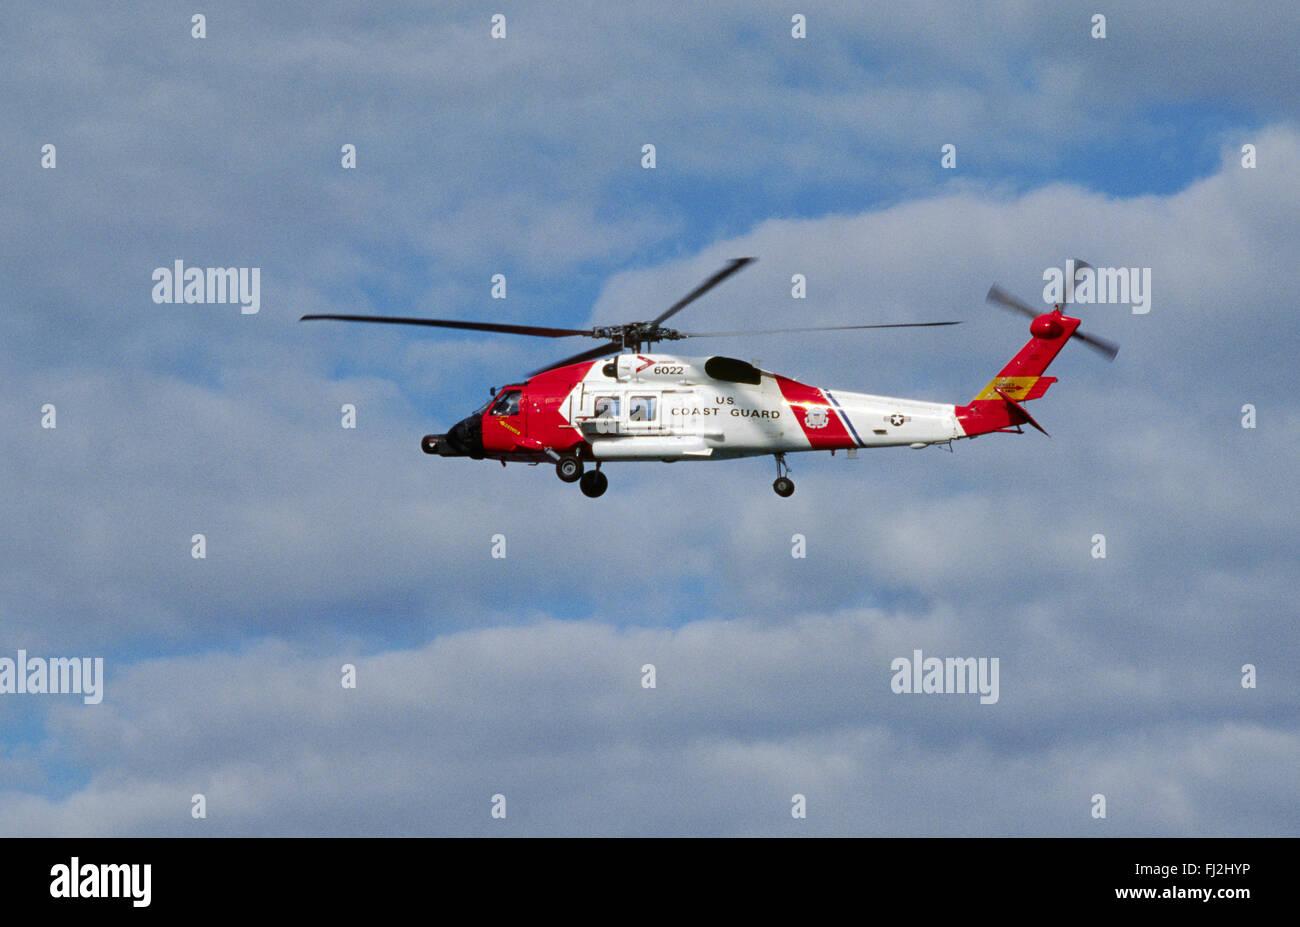 US COASTGUARD HELICOPTER over Glacier Bay - ALASKA - Stock Image